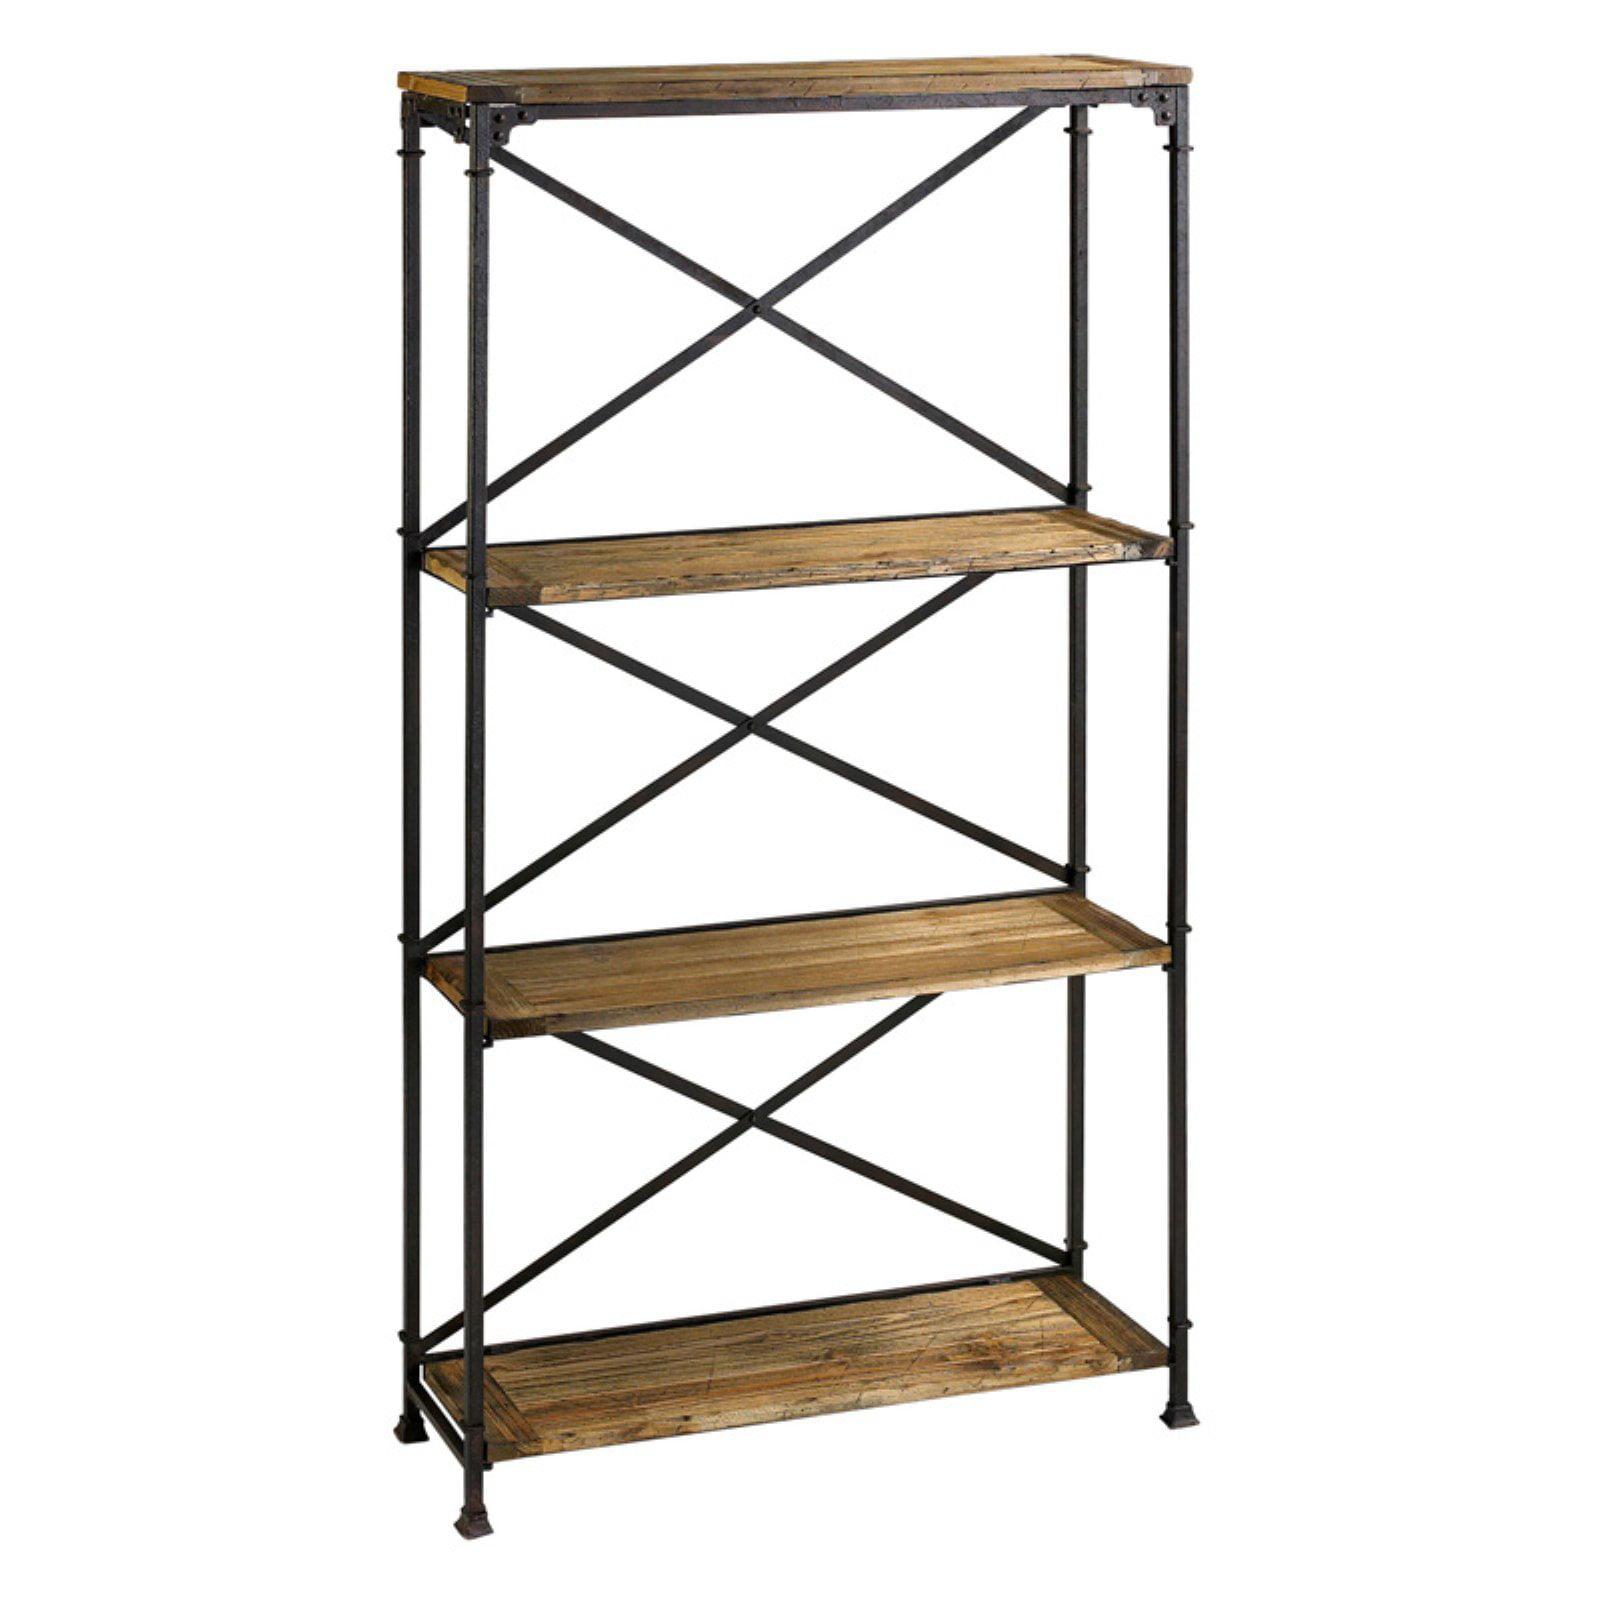 Cyan Design Monacco Etagere Bookcase by Cyan Design